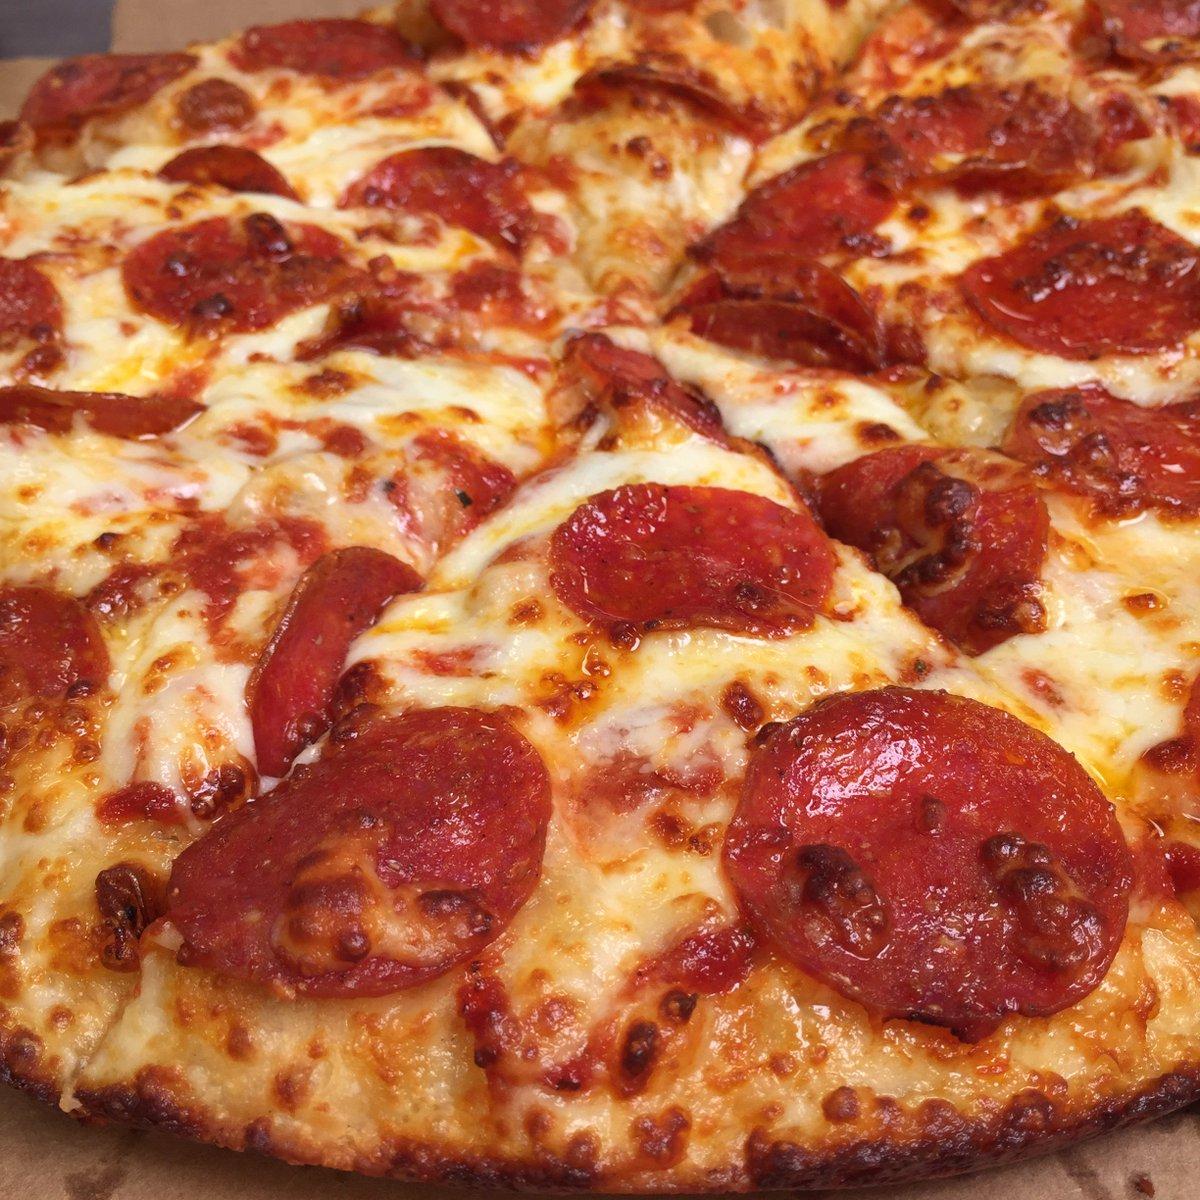 Domino 39 s pizza dominos twitter - Dominos pizza paterna ...